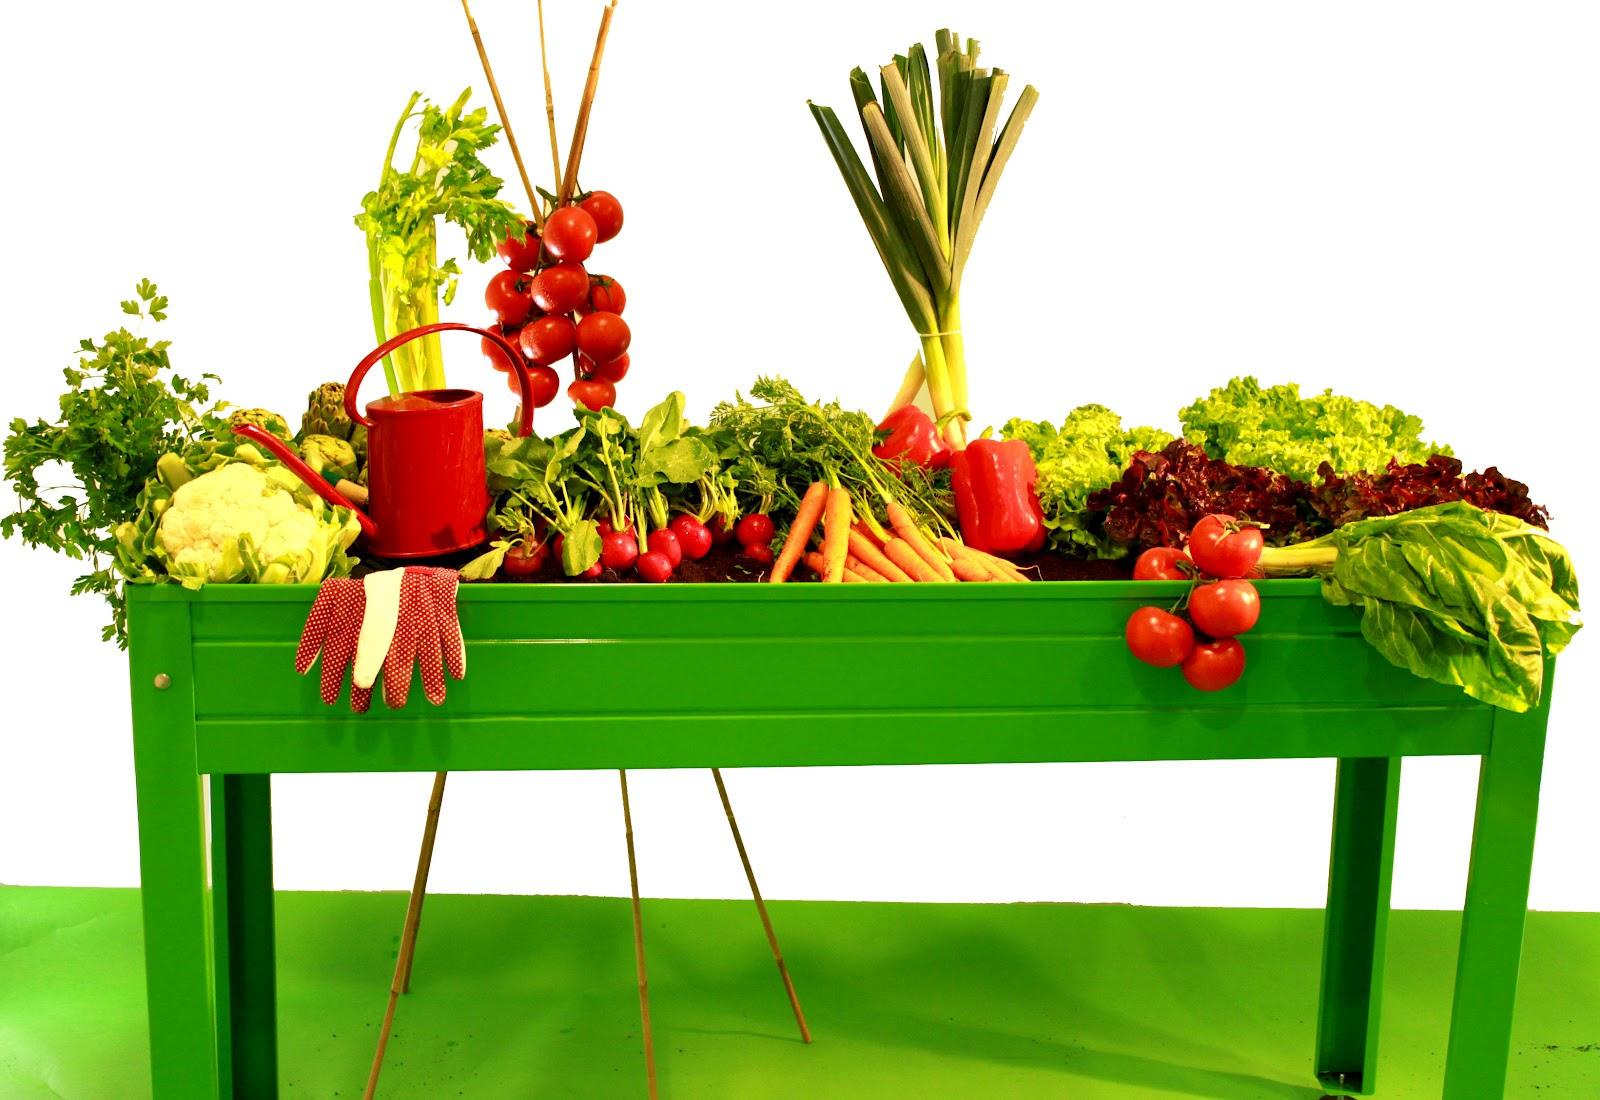 Missjardin mesas de cultivo para huertos urbanos - Huertos urbanos ikea ...